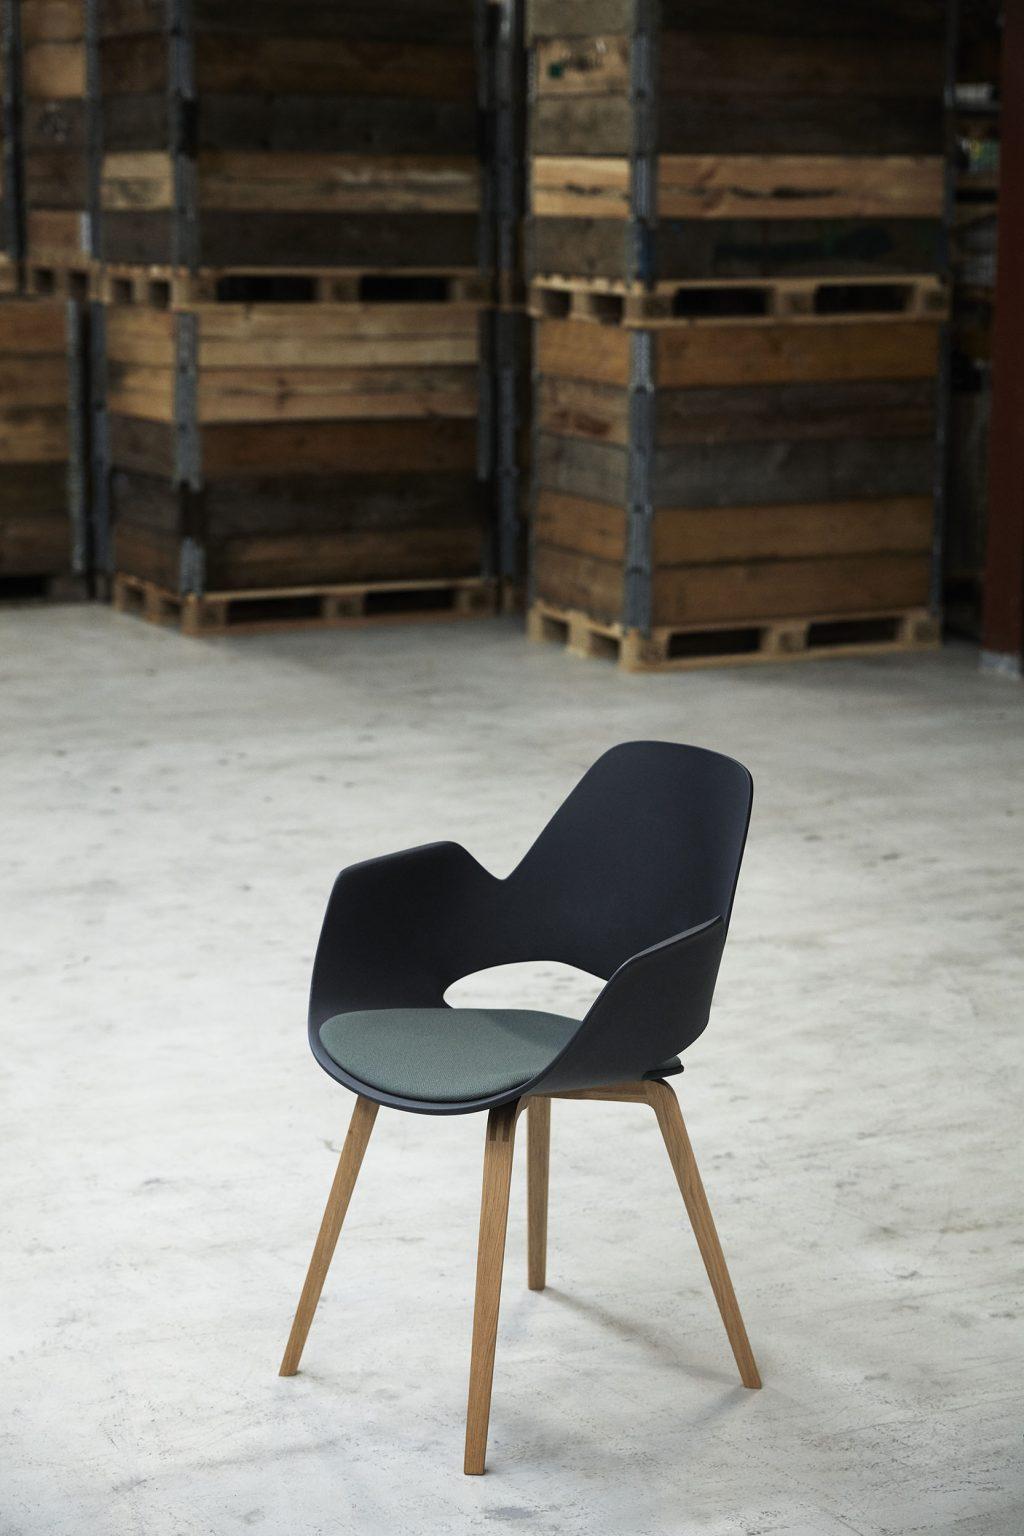 Biennale Interieur - Belgium's leading design and interior event - Falkchair_oak_04_low-res_houe.jpg